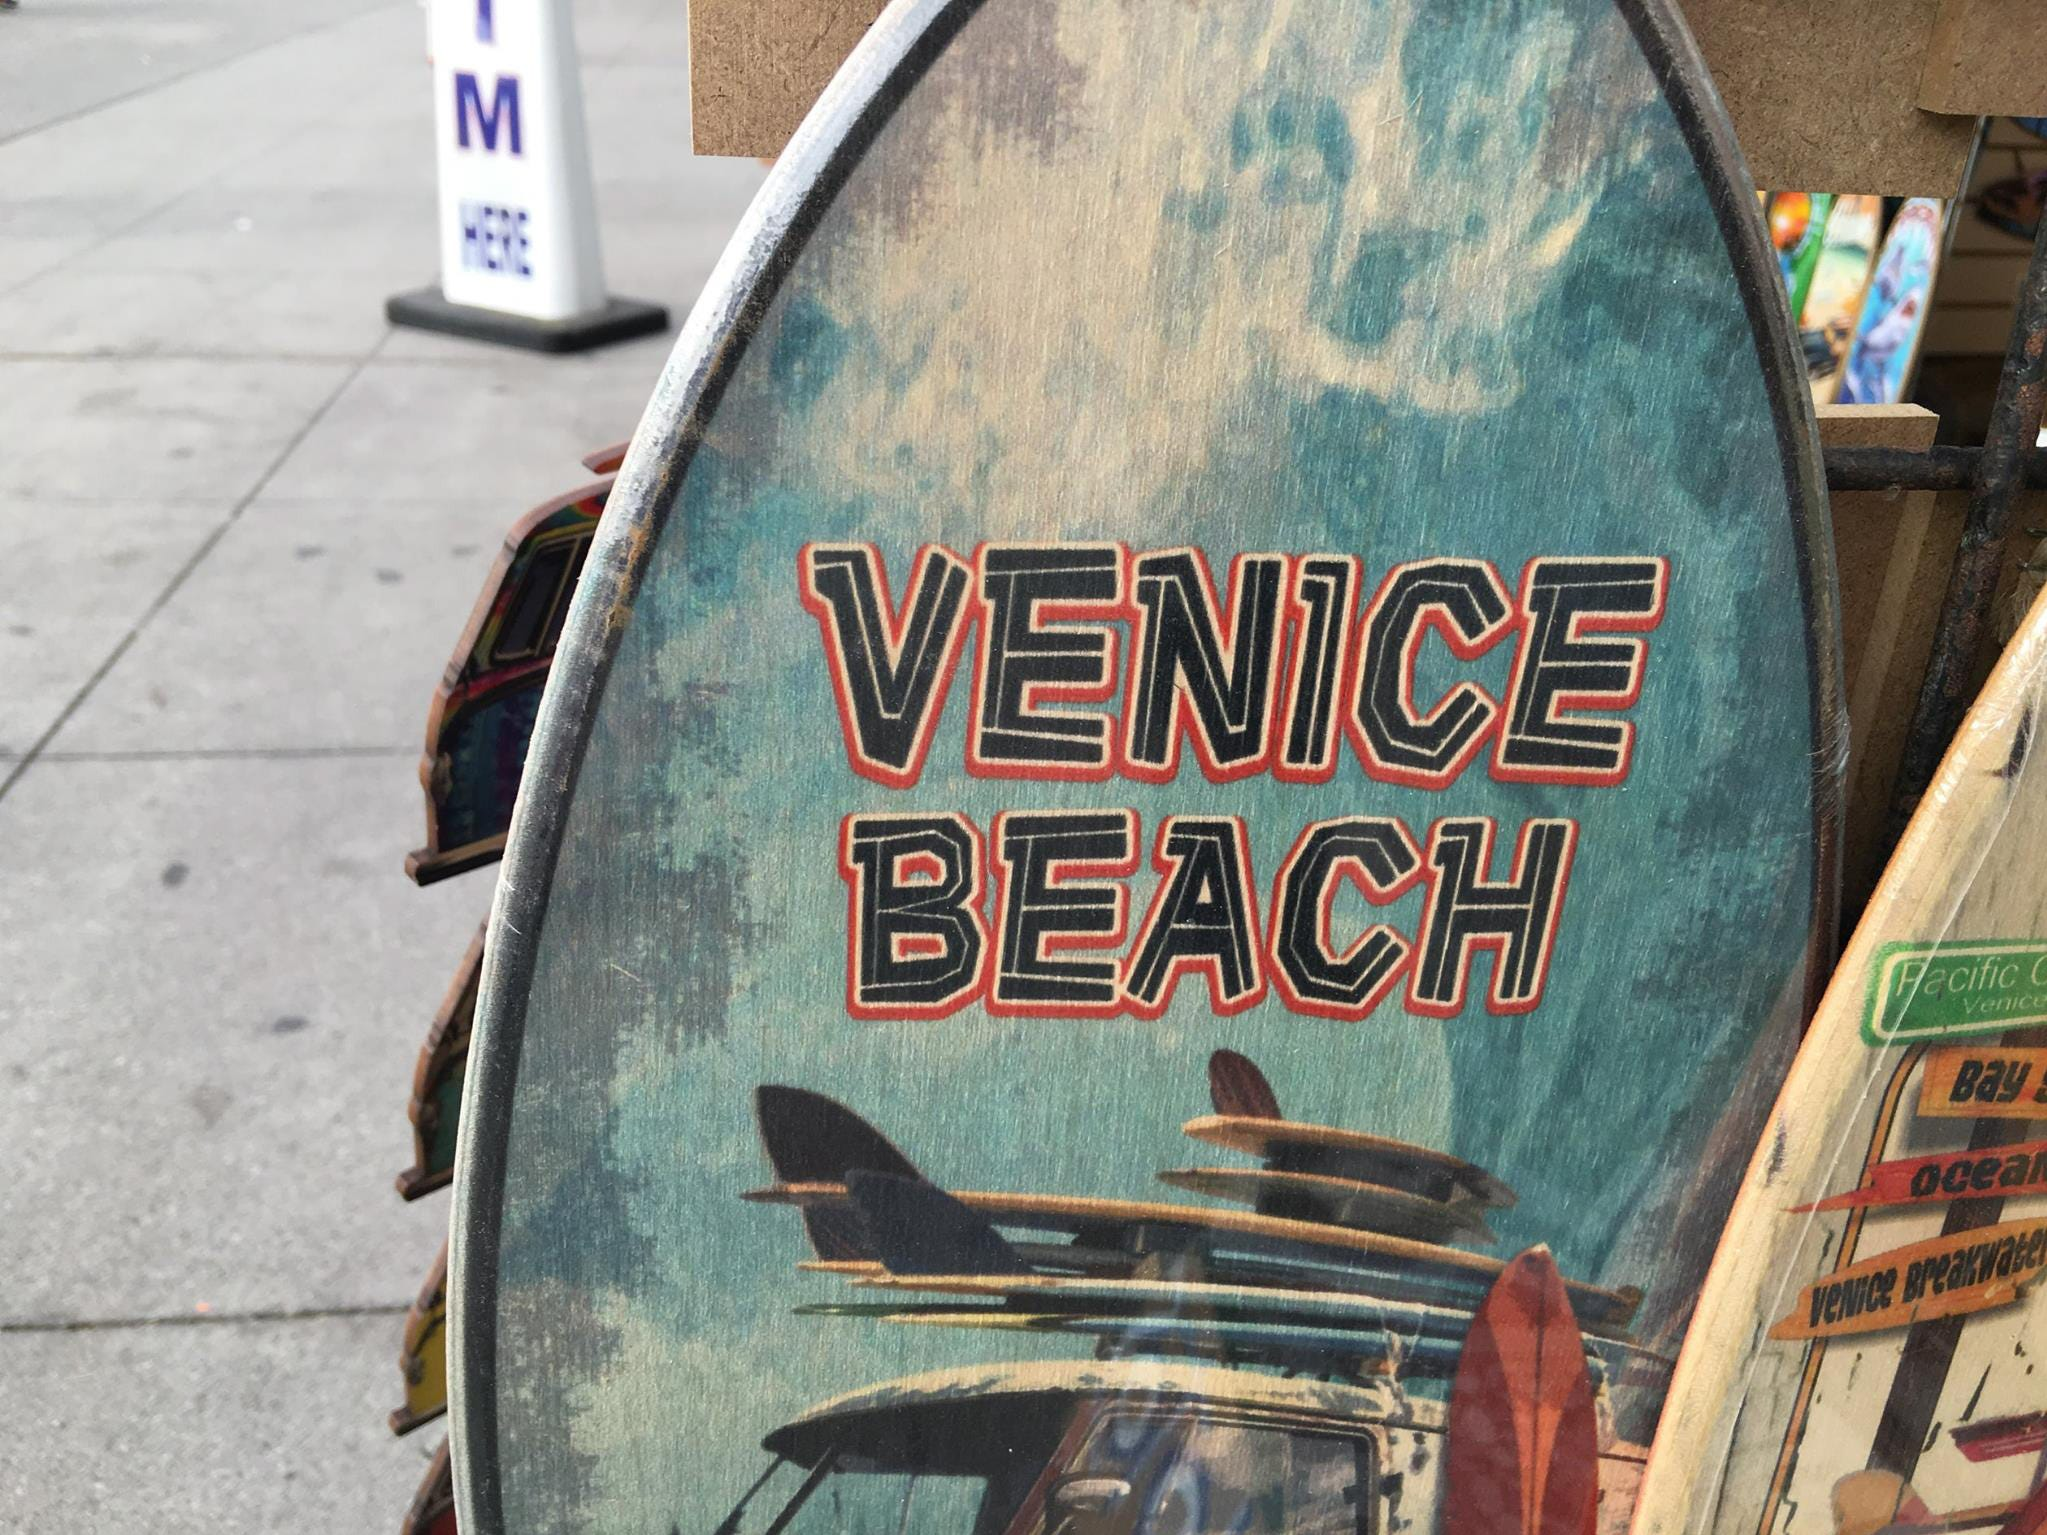 A painted Venice Beach surfboard